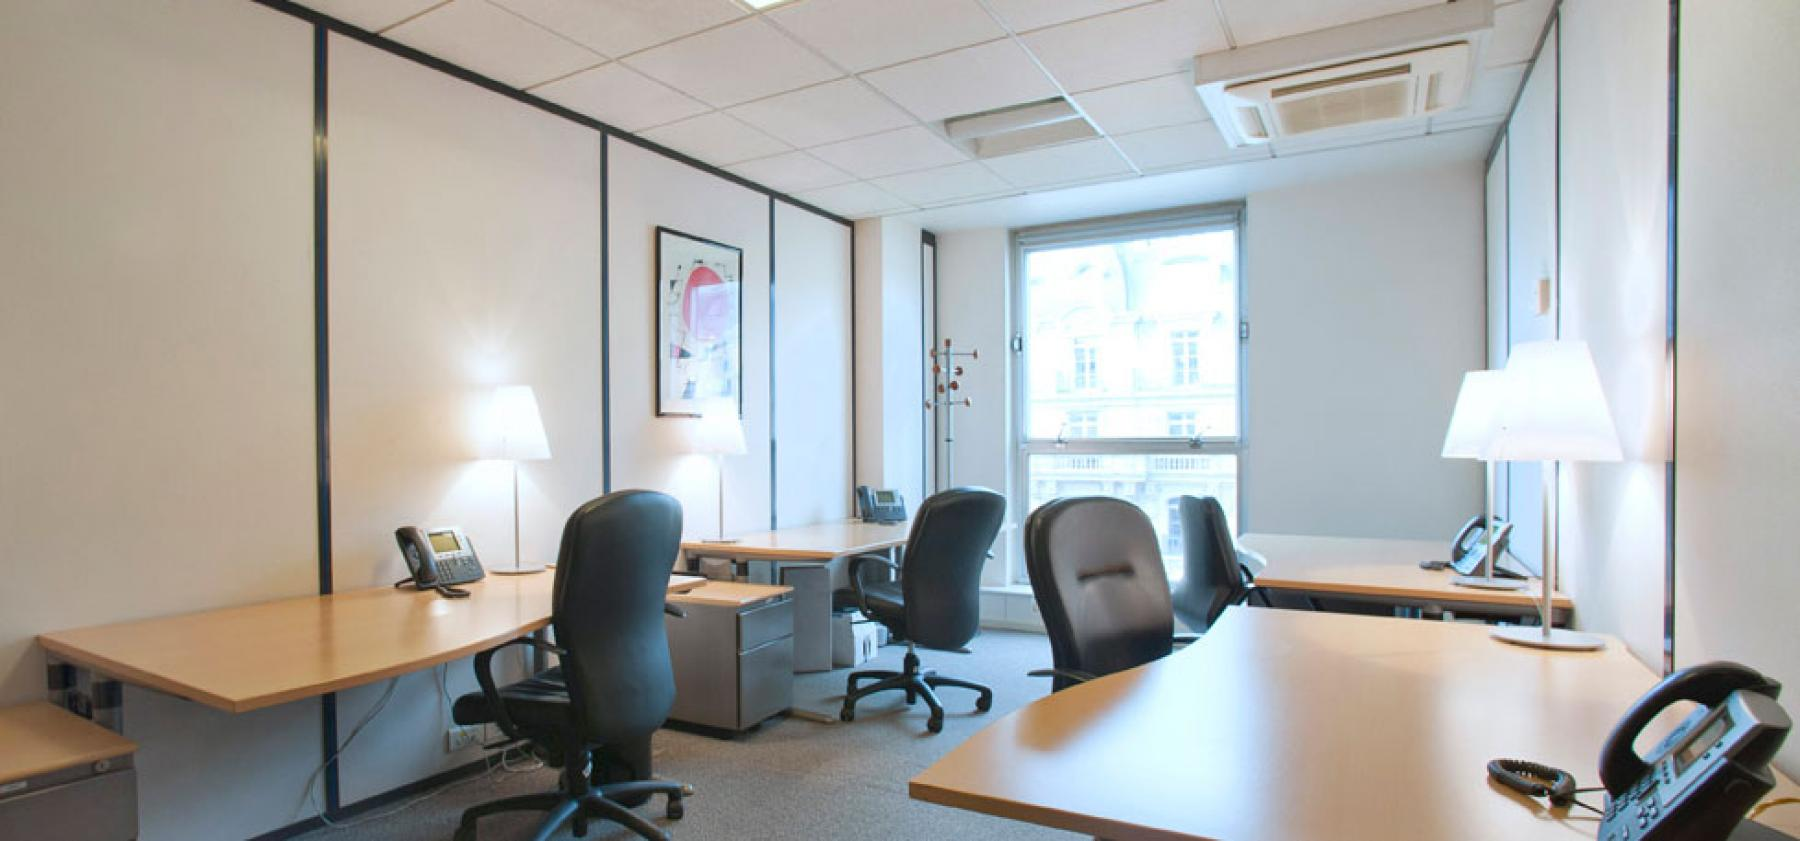 Location bureau Avenue Montaigne 42, Paris (2)